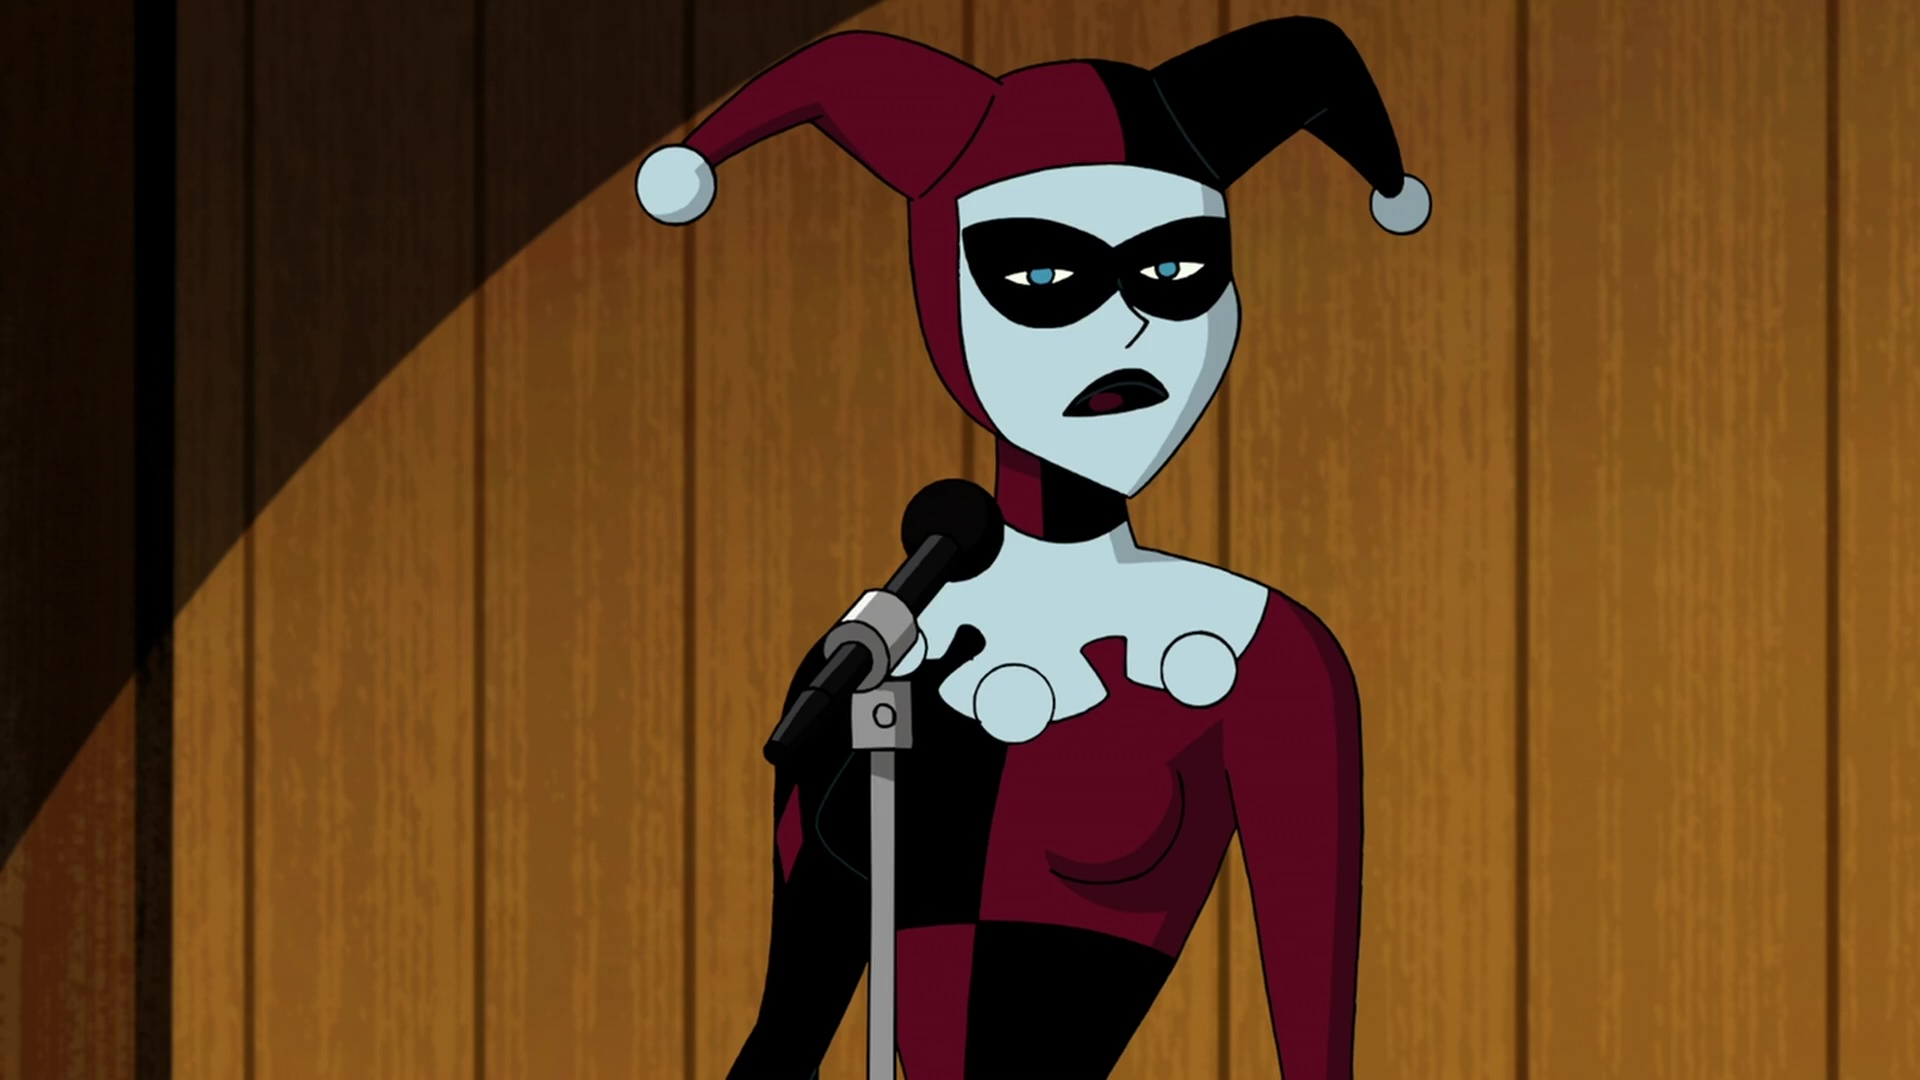 Batman Y Harley Quinn 1080p Lat-Cast-Ing[Animacion](2017)